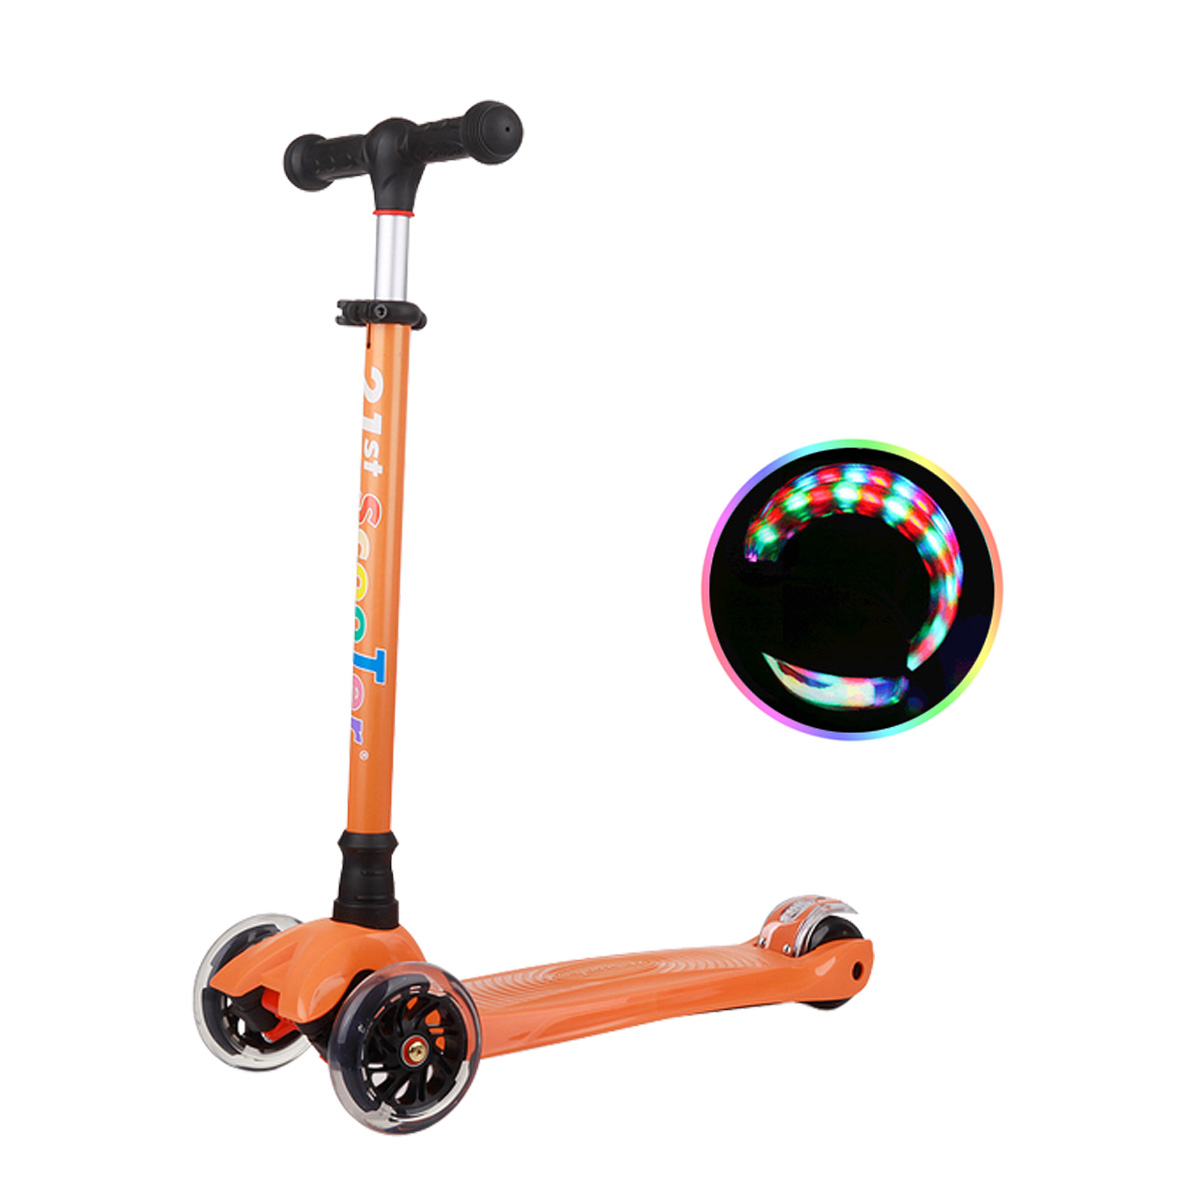 21st ScooTer 아동용 킥보드, 05_21st scooter 컬러플 착탈식 주황.